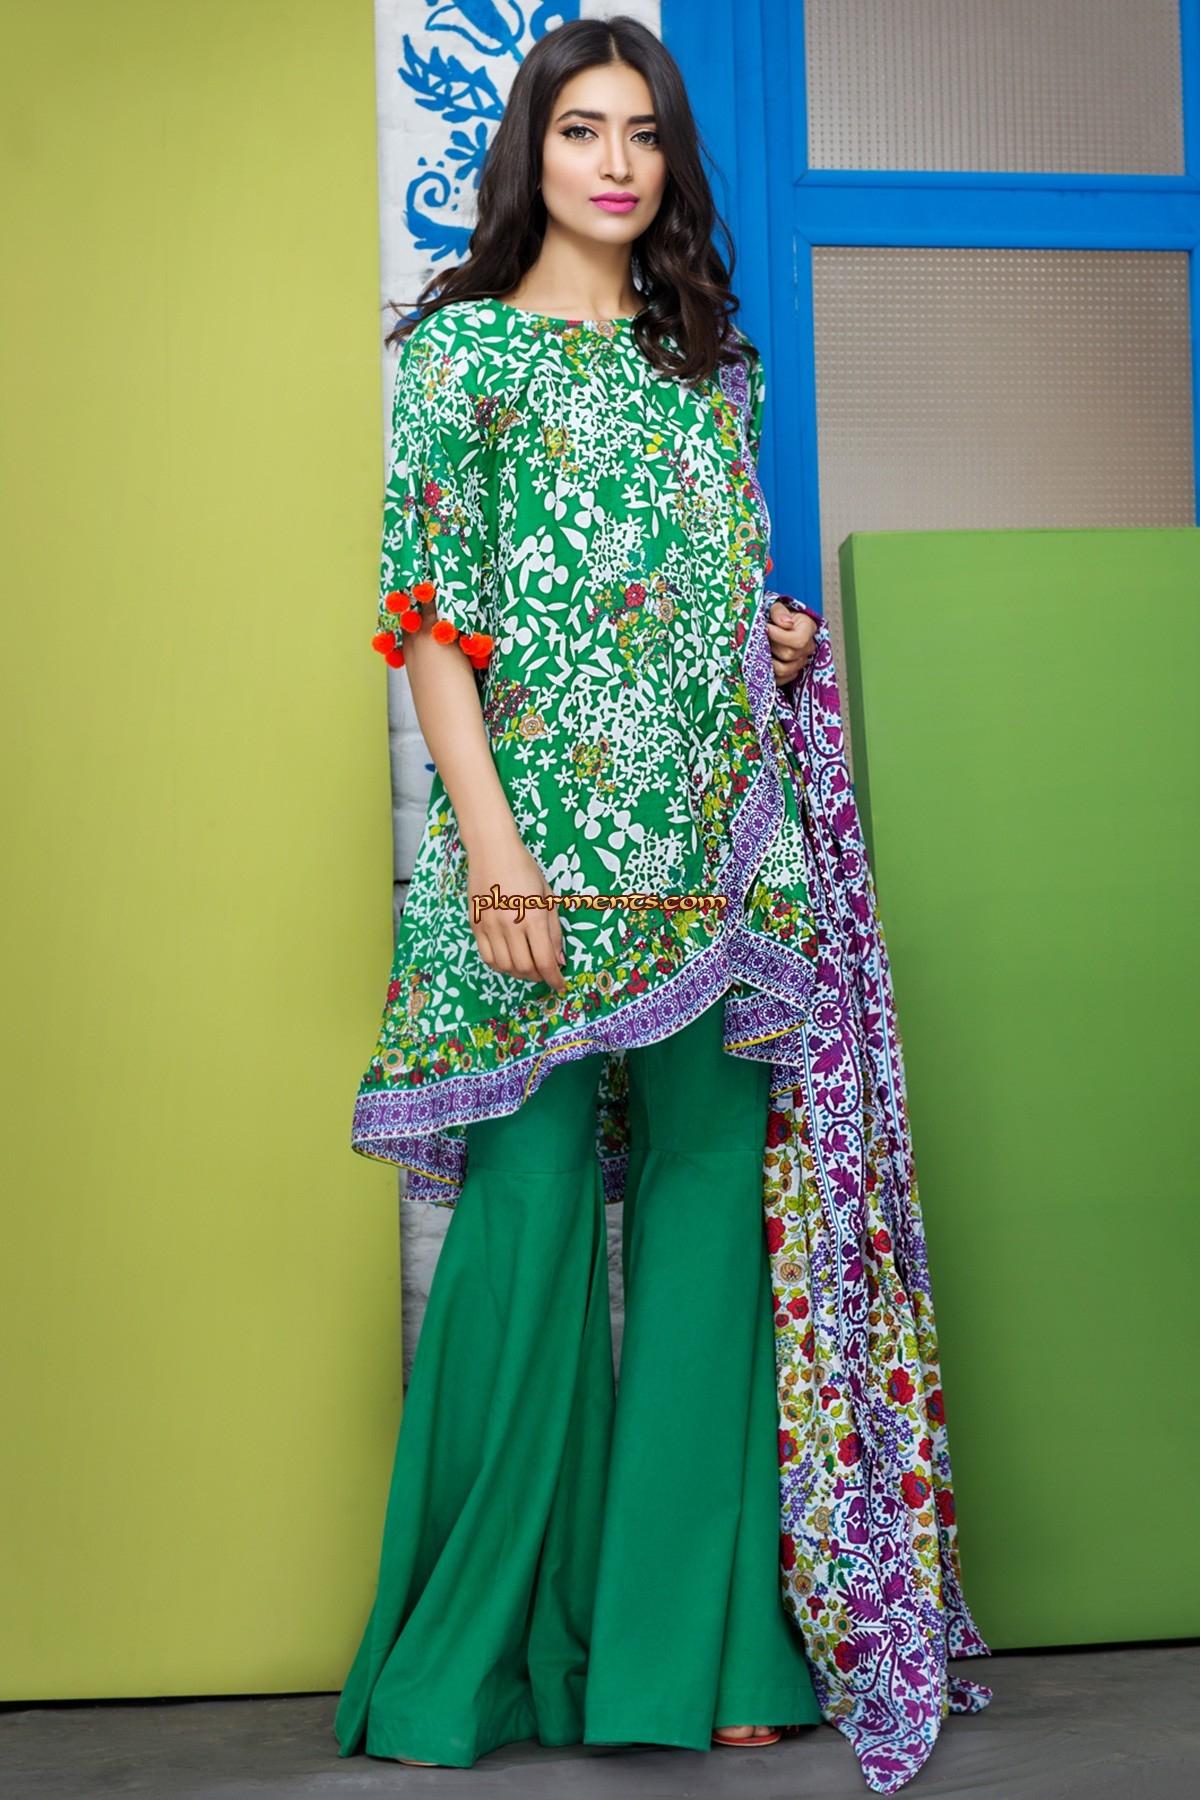 Shirt design lawn - Printed Lawn Shirt 3m Lawn Shalwar 2 5m Lawn Dupatta 2 5m